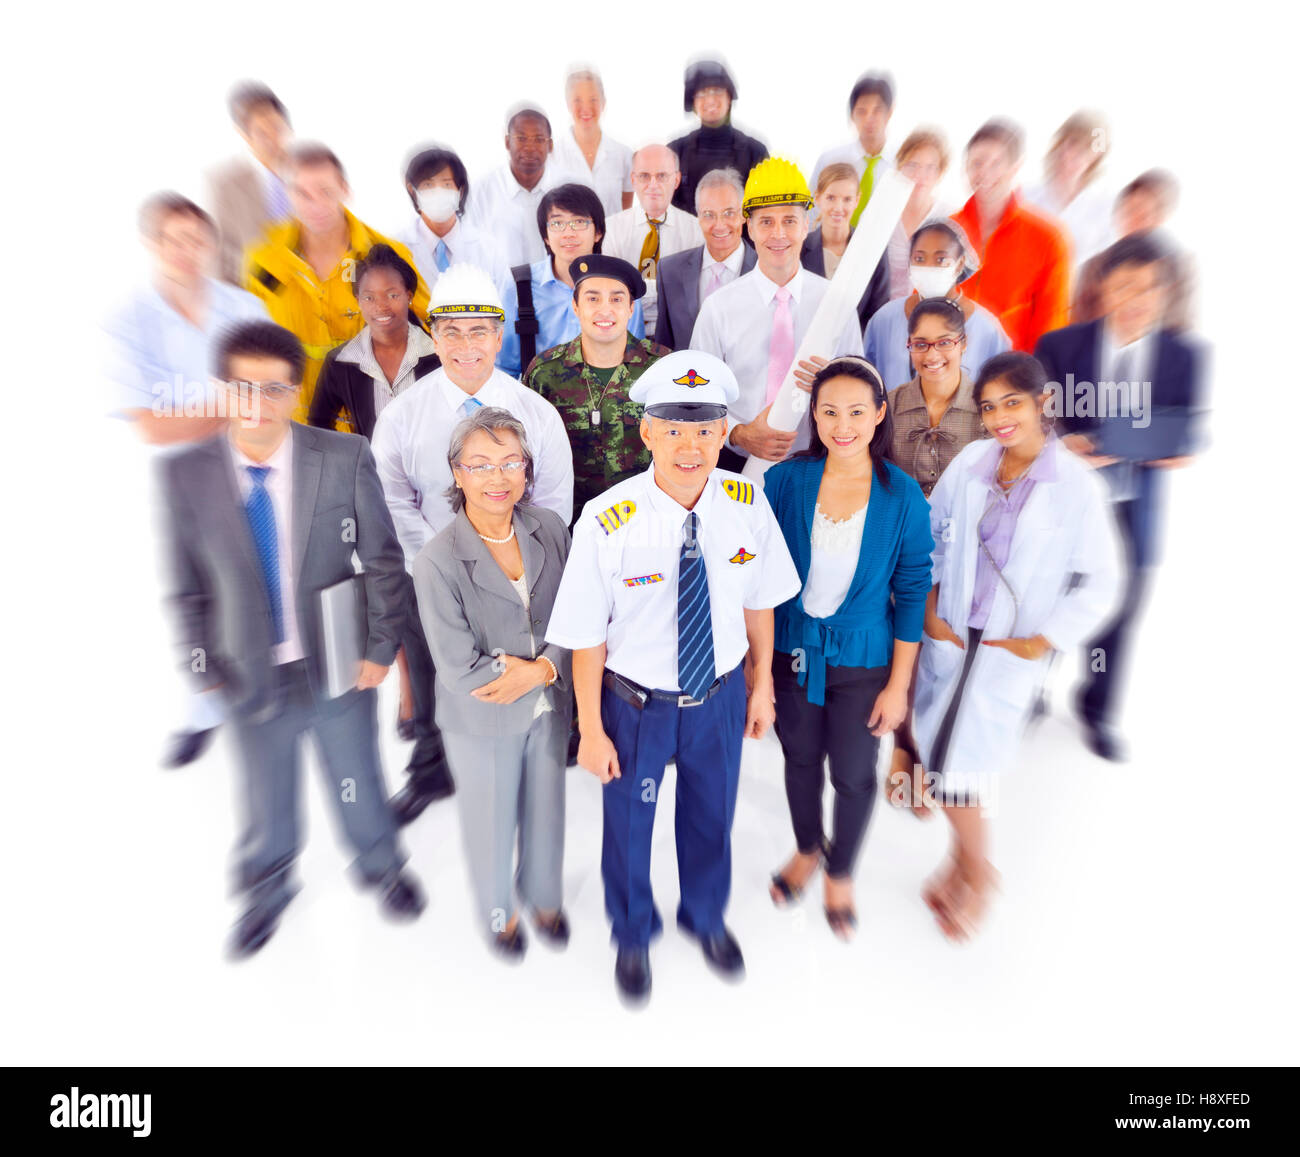 Variation Occupation Job Duty Uniform Concept - Stock Image